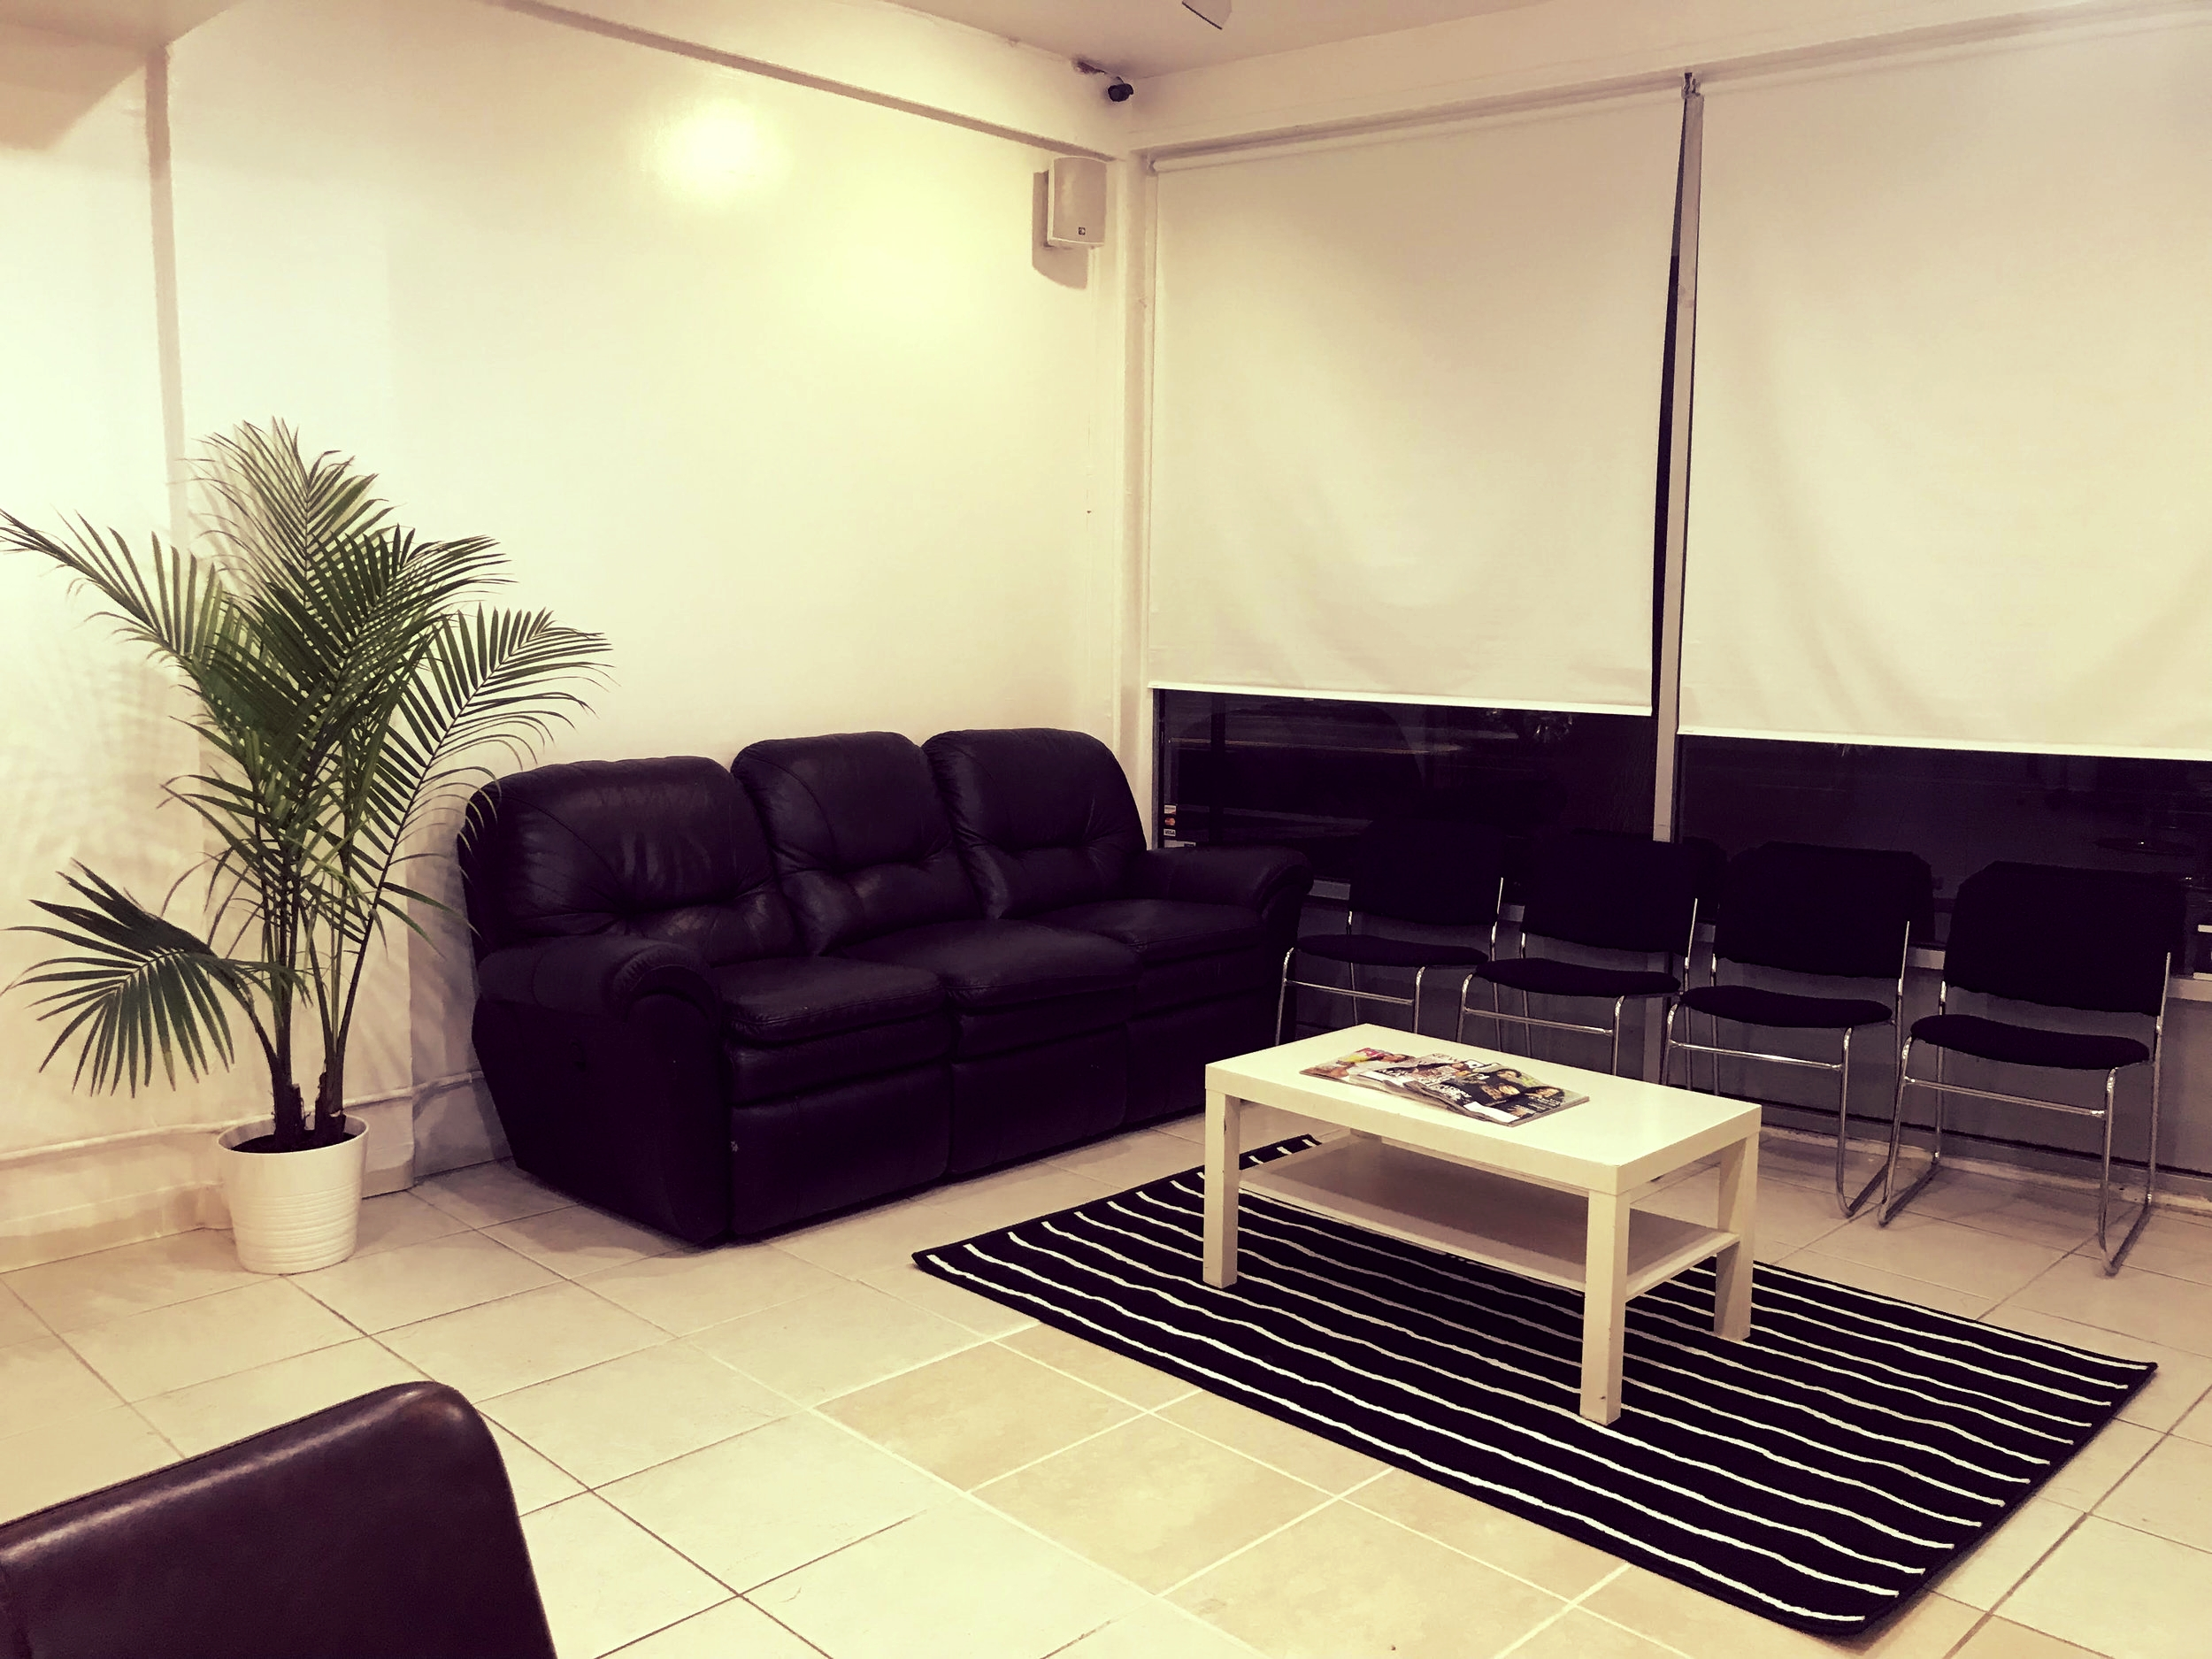 salon-sitting-area.jpg